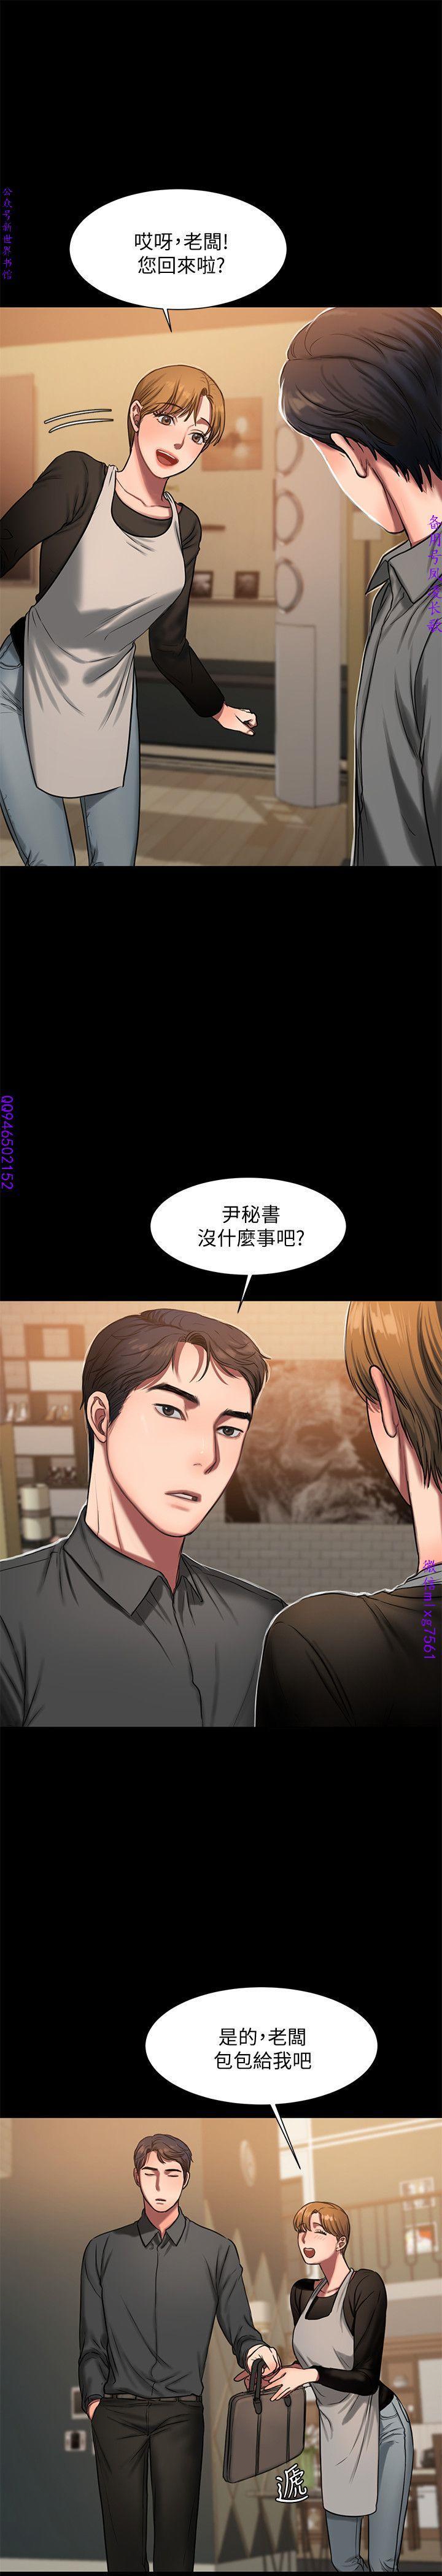 Run away 1-10【中文】 211